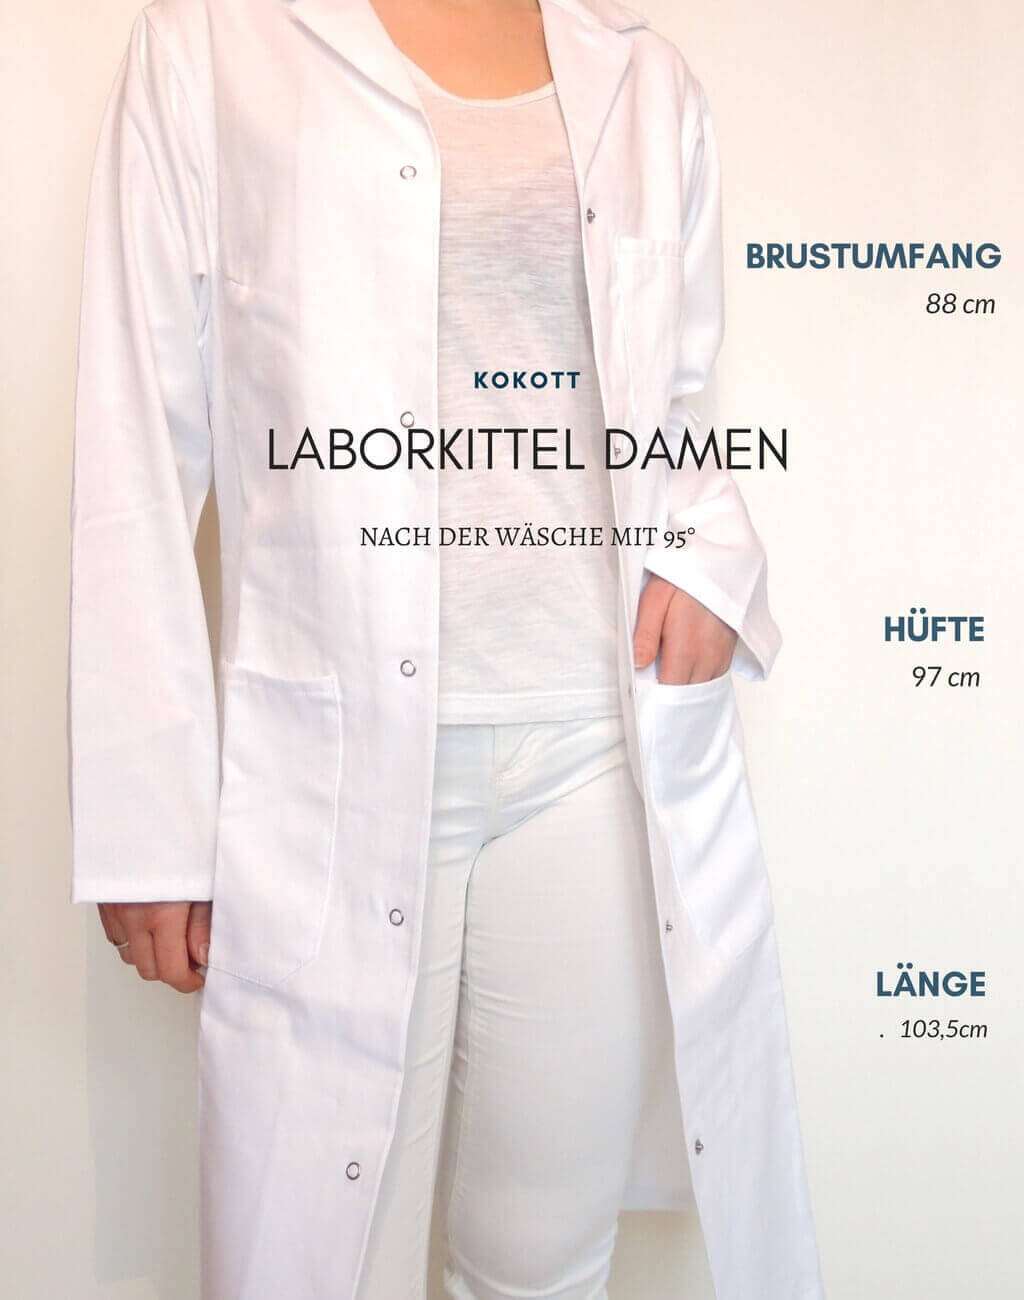 Kokott-Laborkittel-günstig-Damen-tailliert-Maße-1